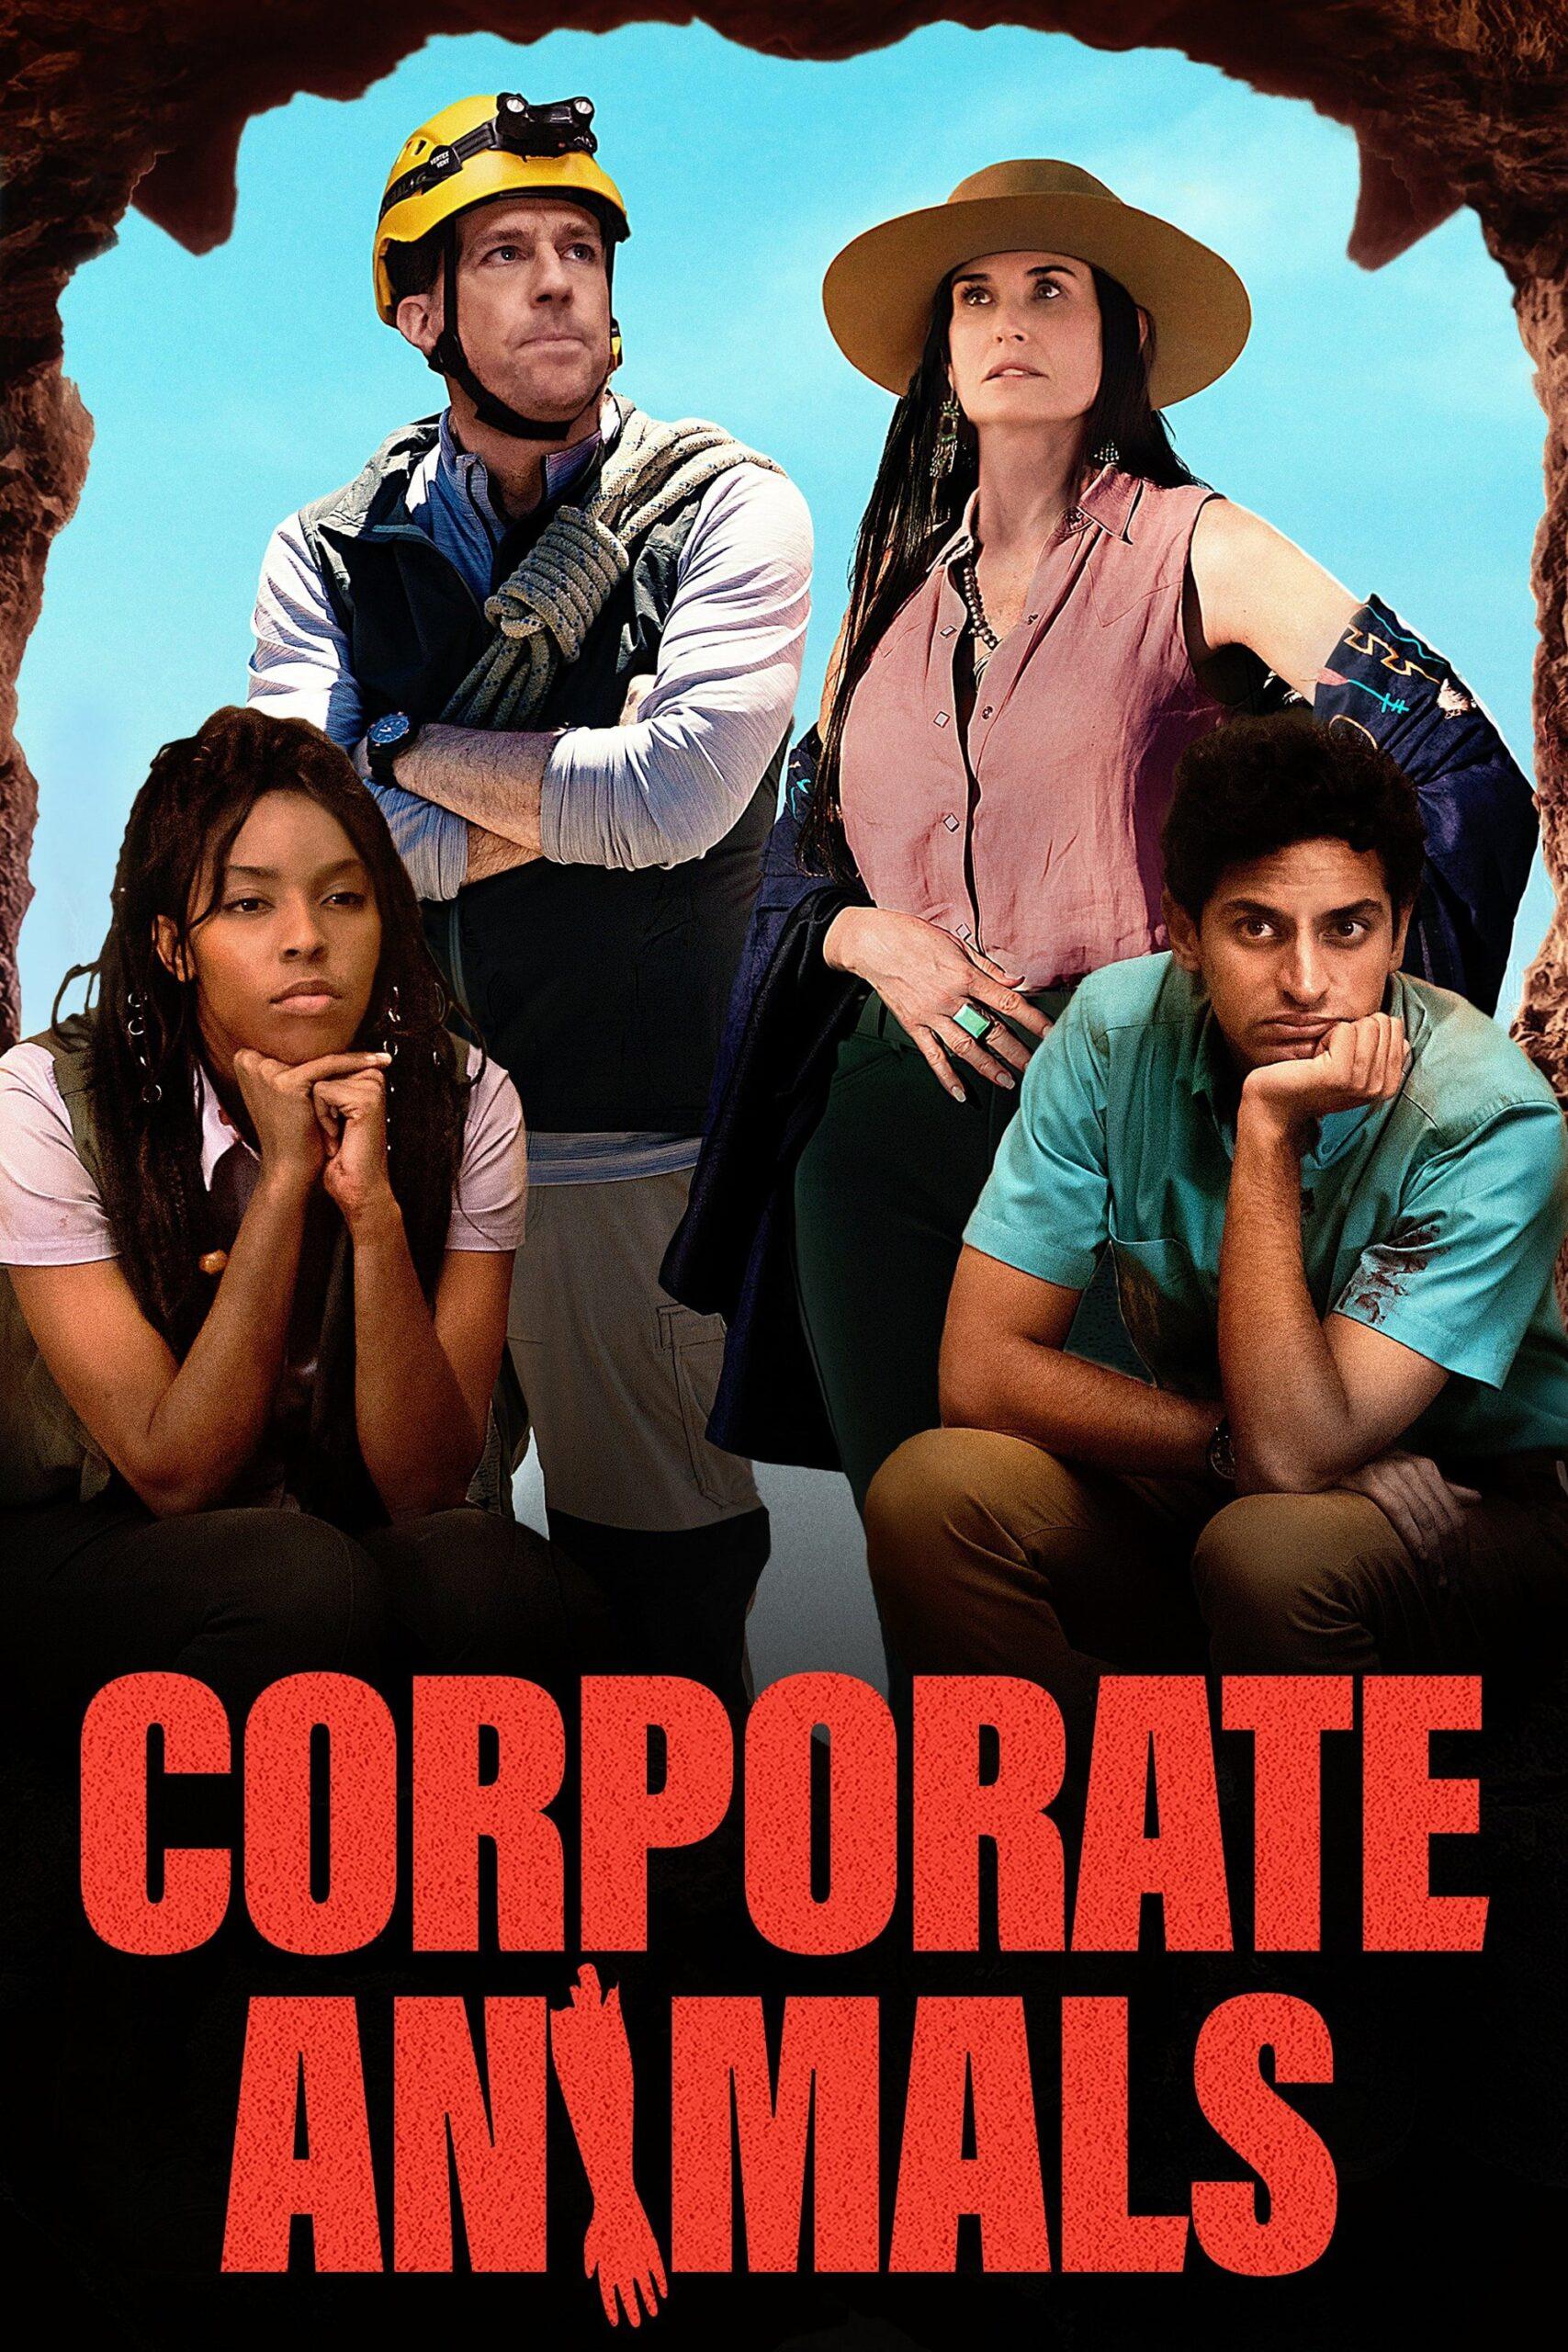 Corporate Animals Movie Streaming Online